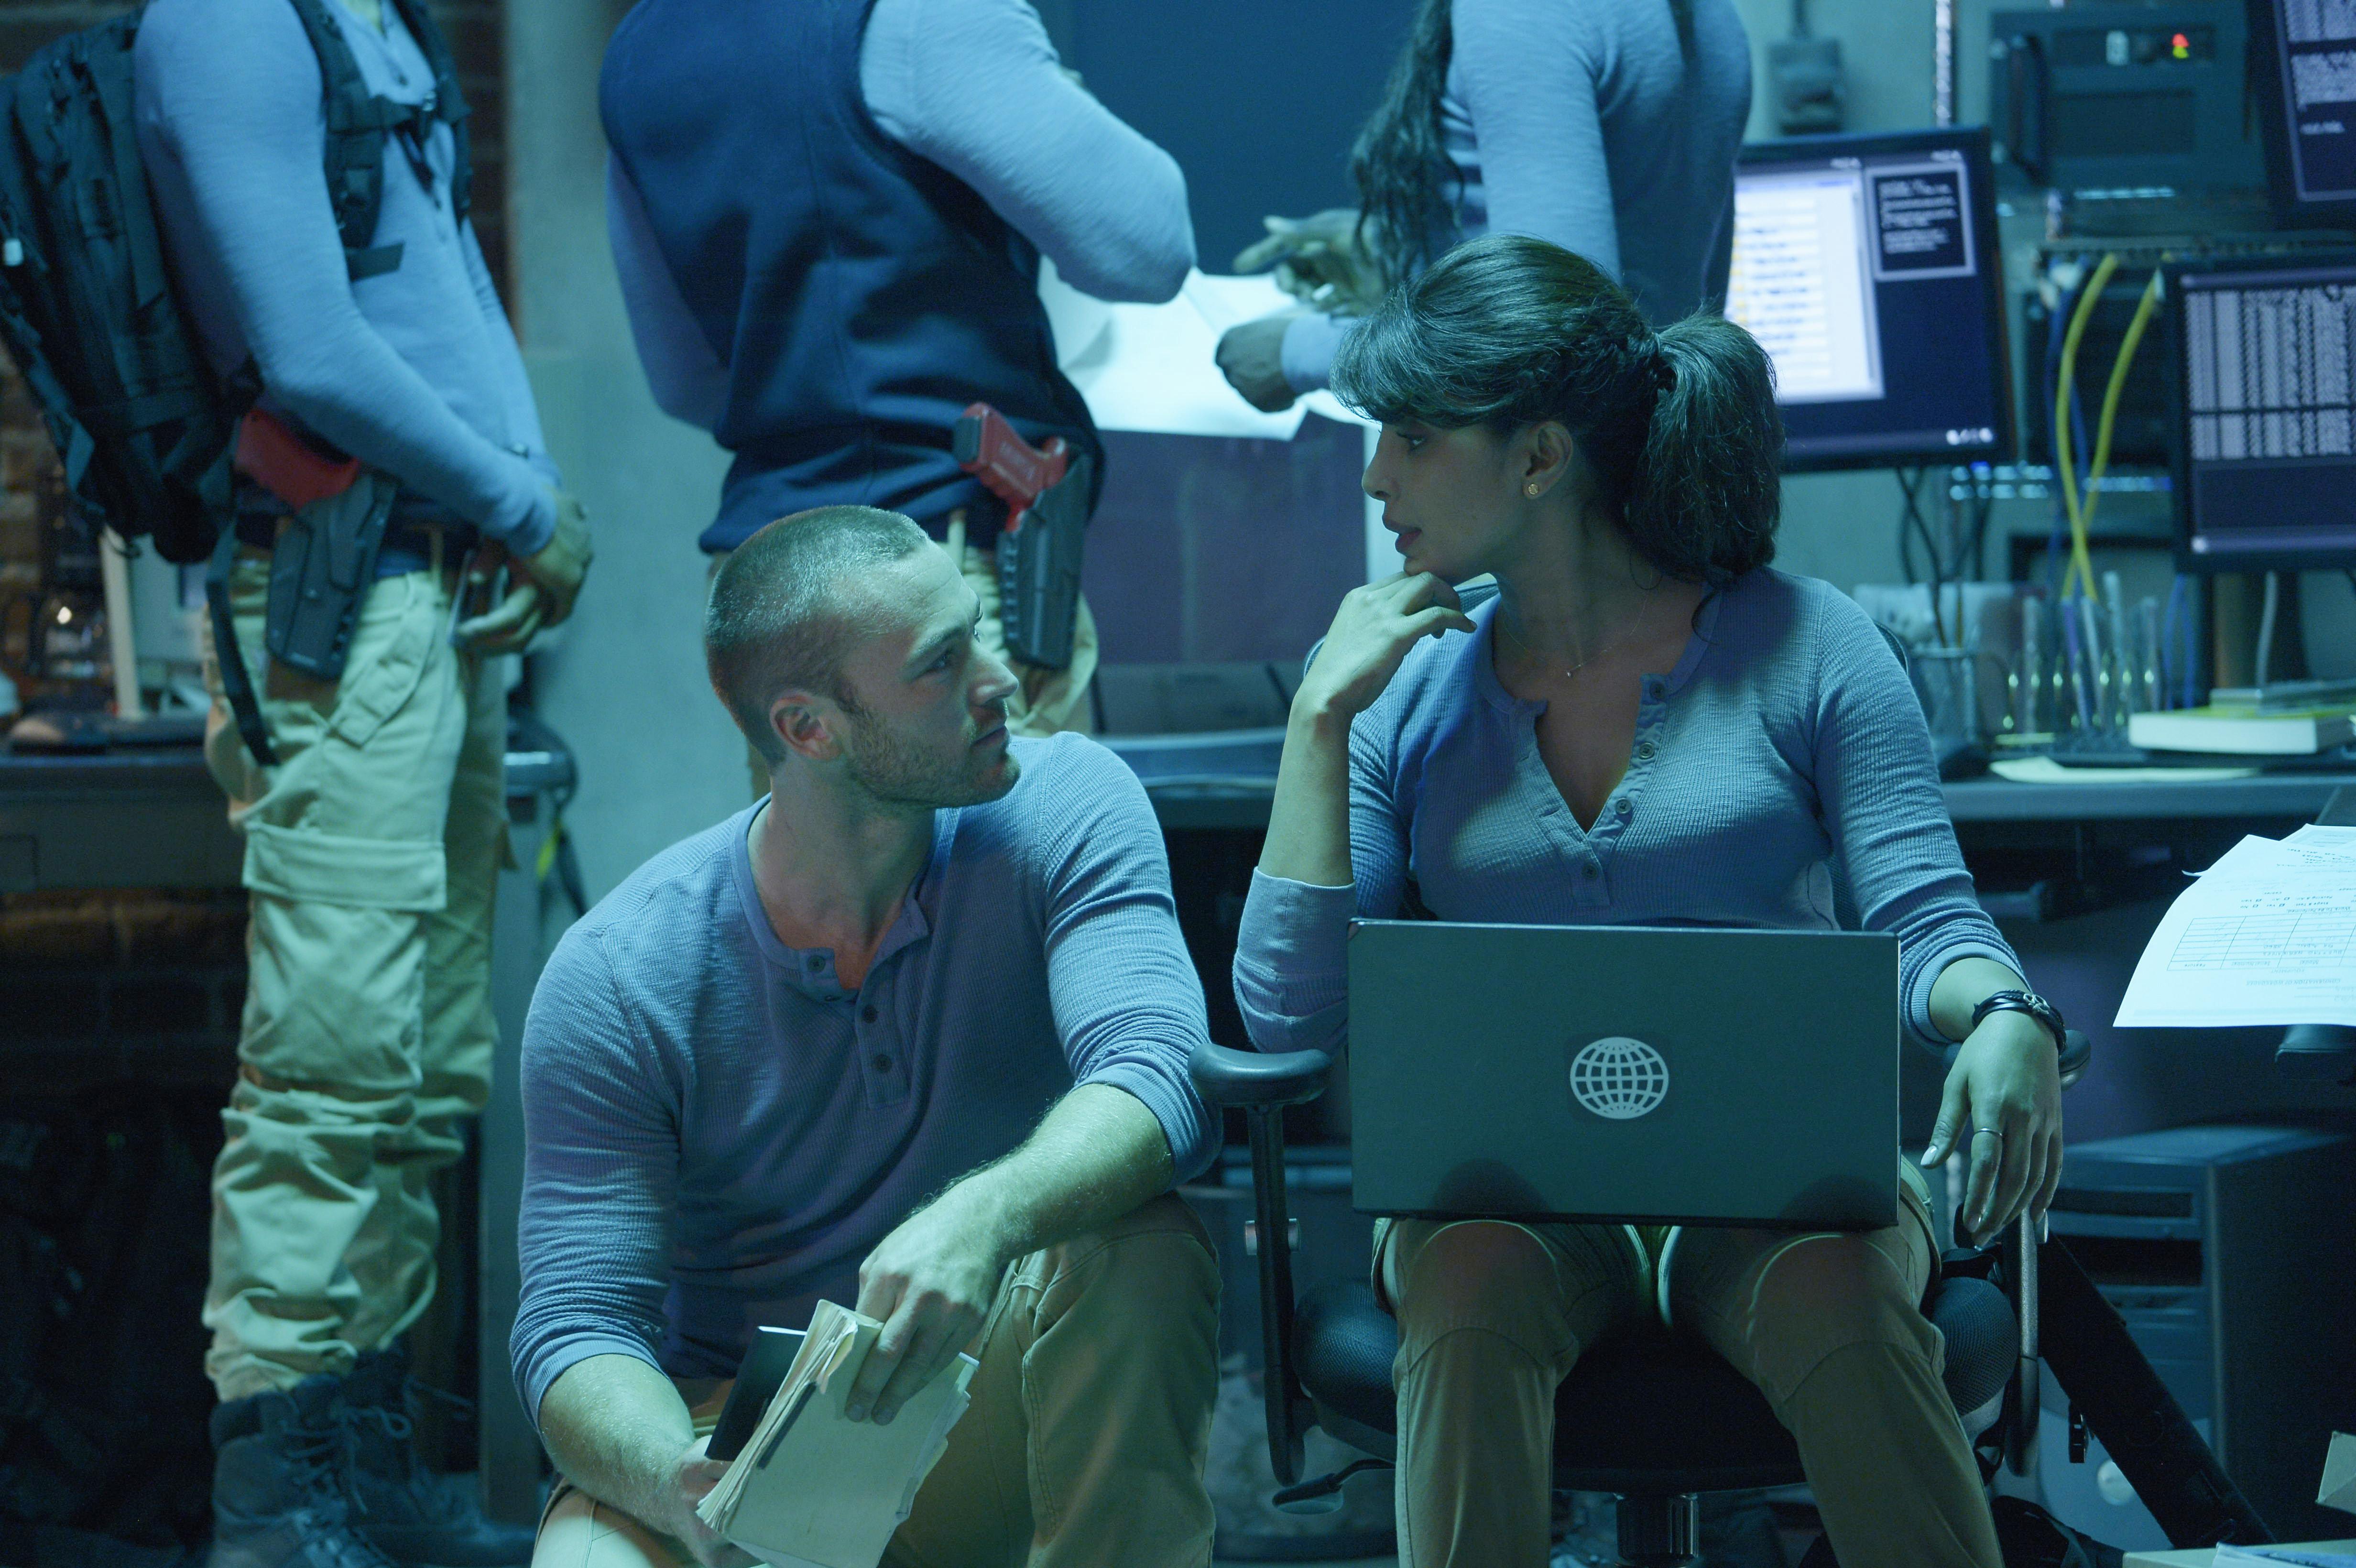 Biker Blog Season 5 Sneak Peek: Quantico Sneak Peek Season 1 Episode 2: Alex Is Armed